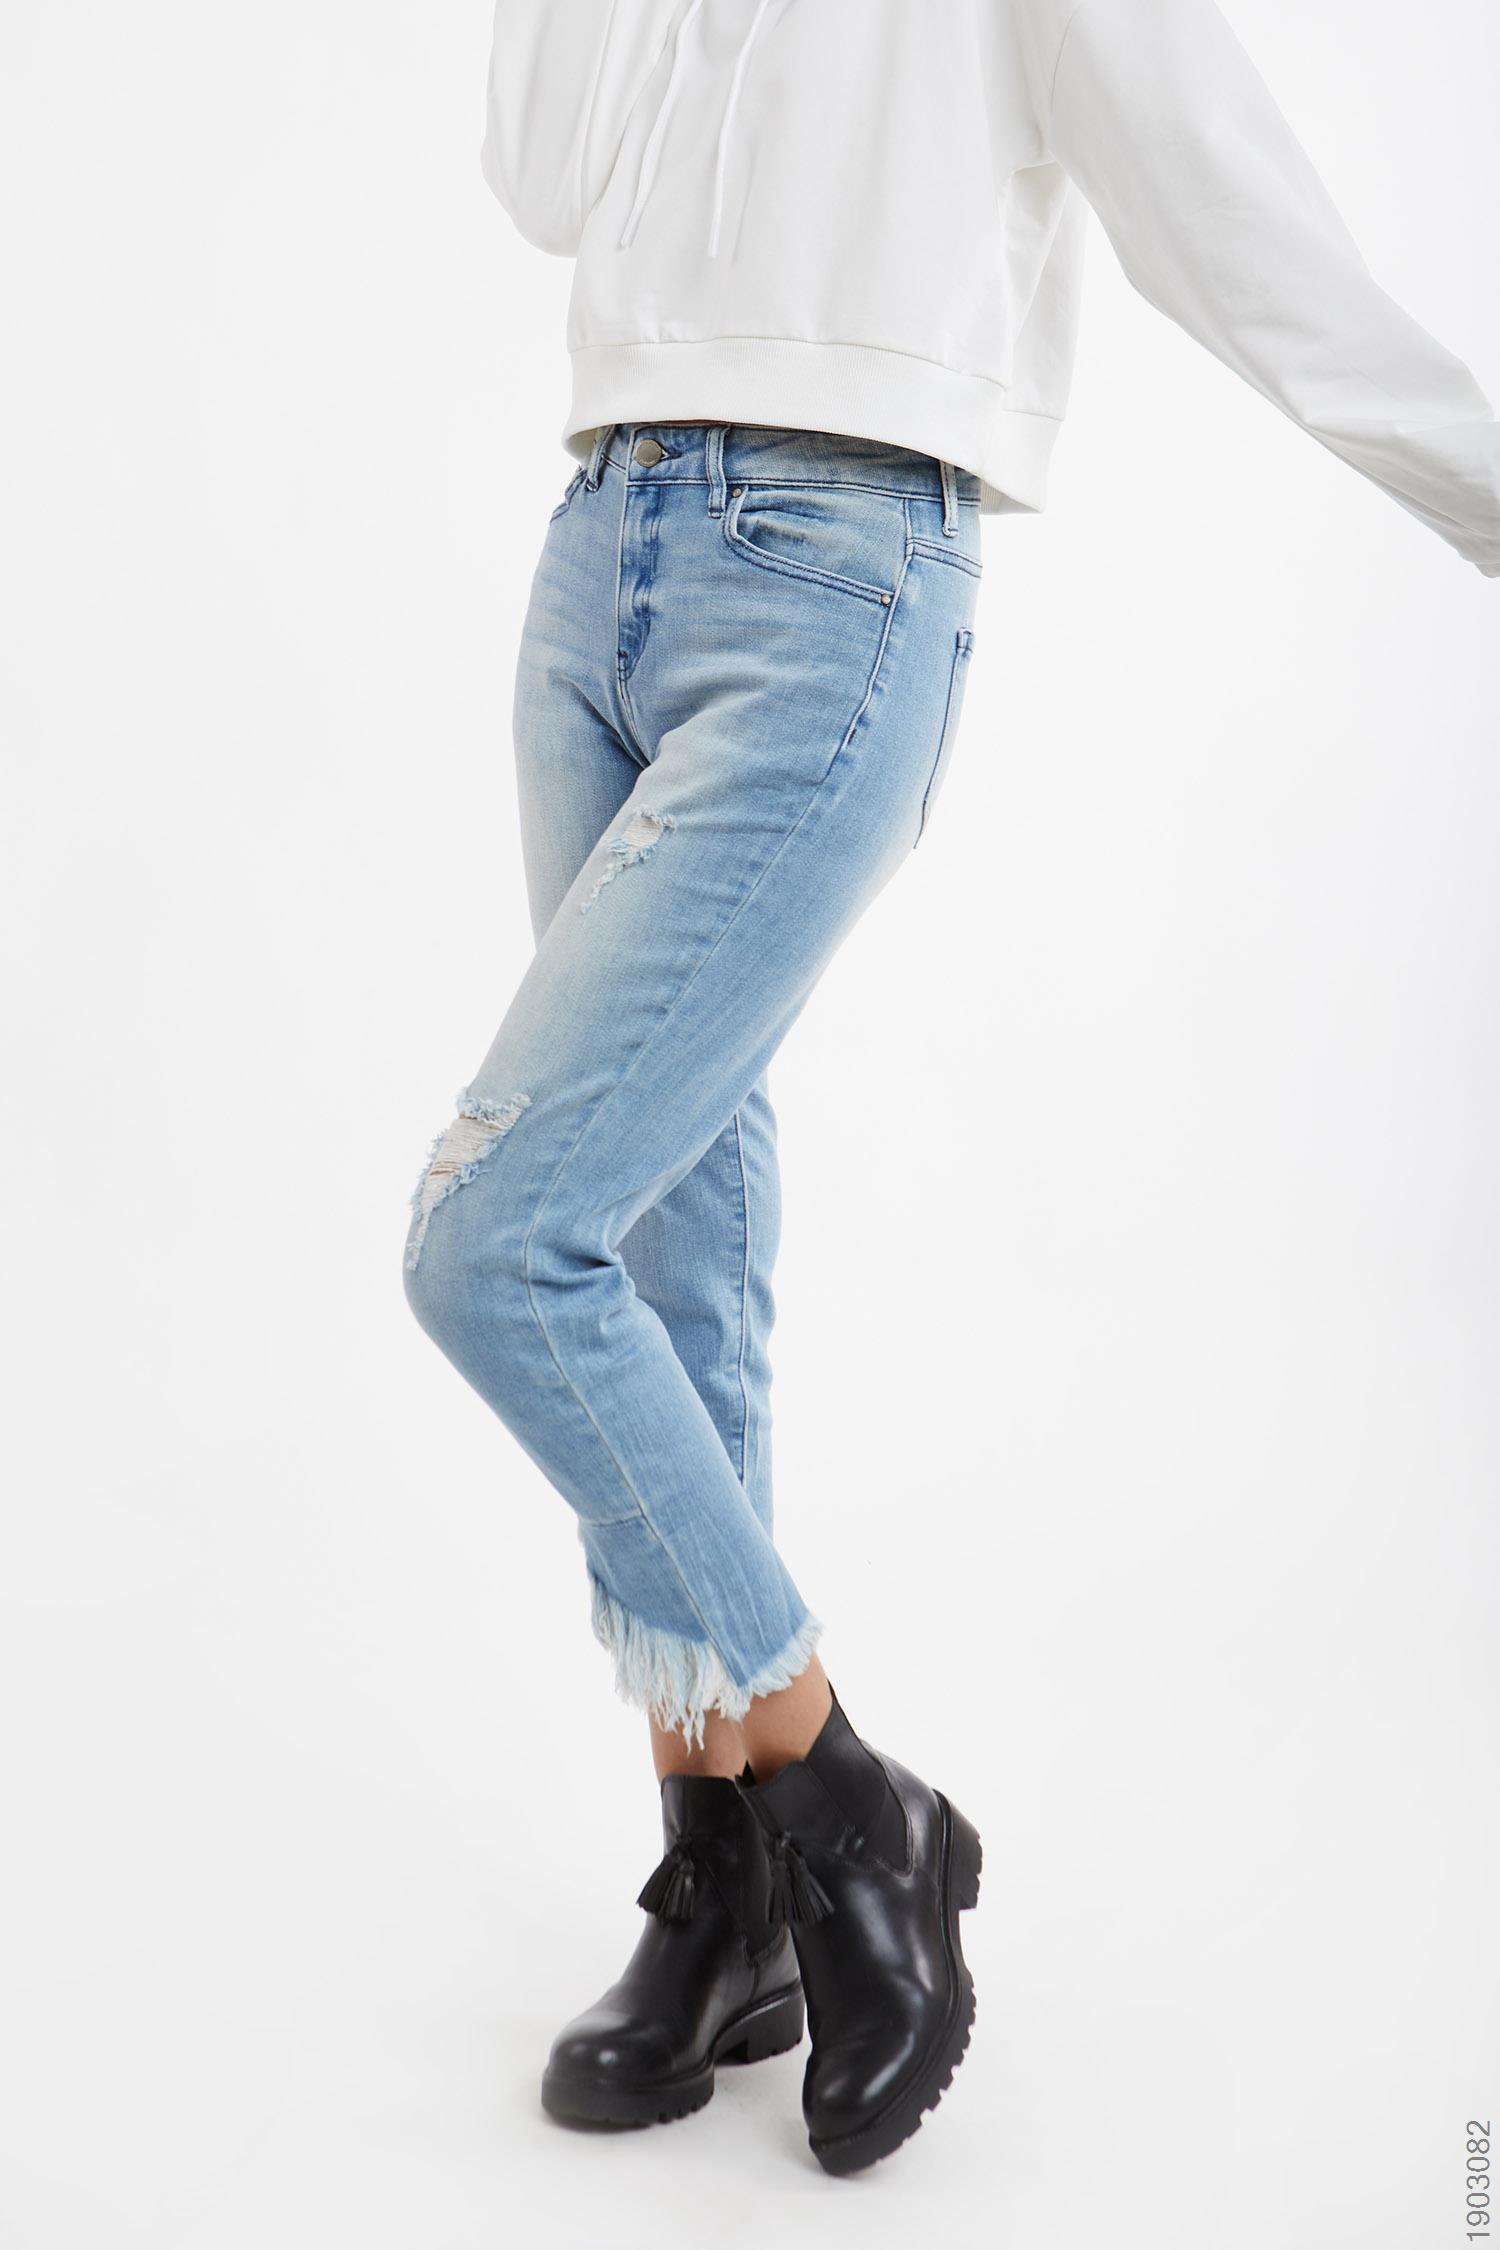 quần jean nữ - 1903082